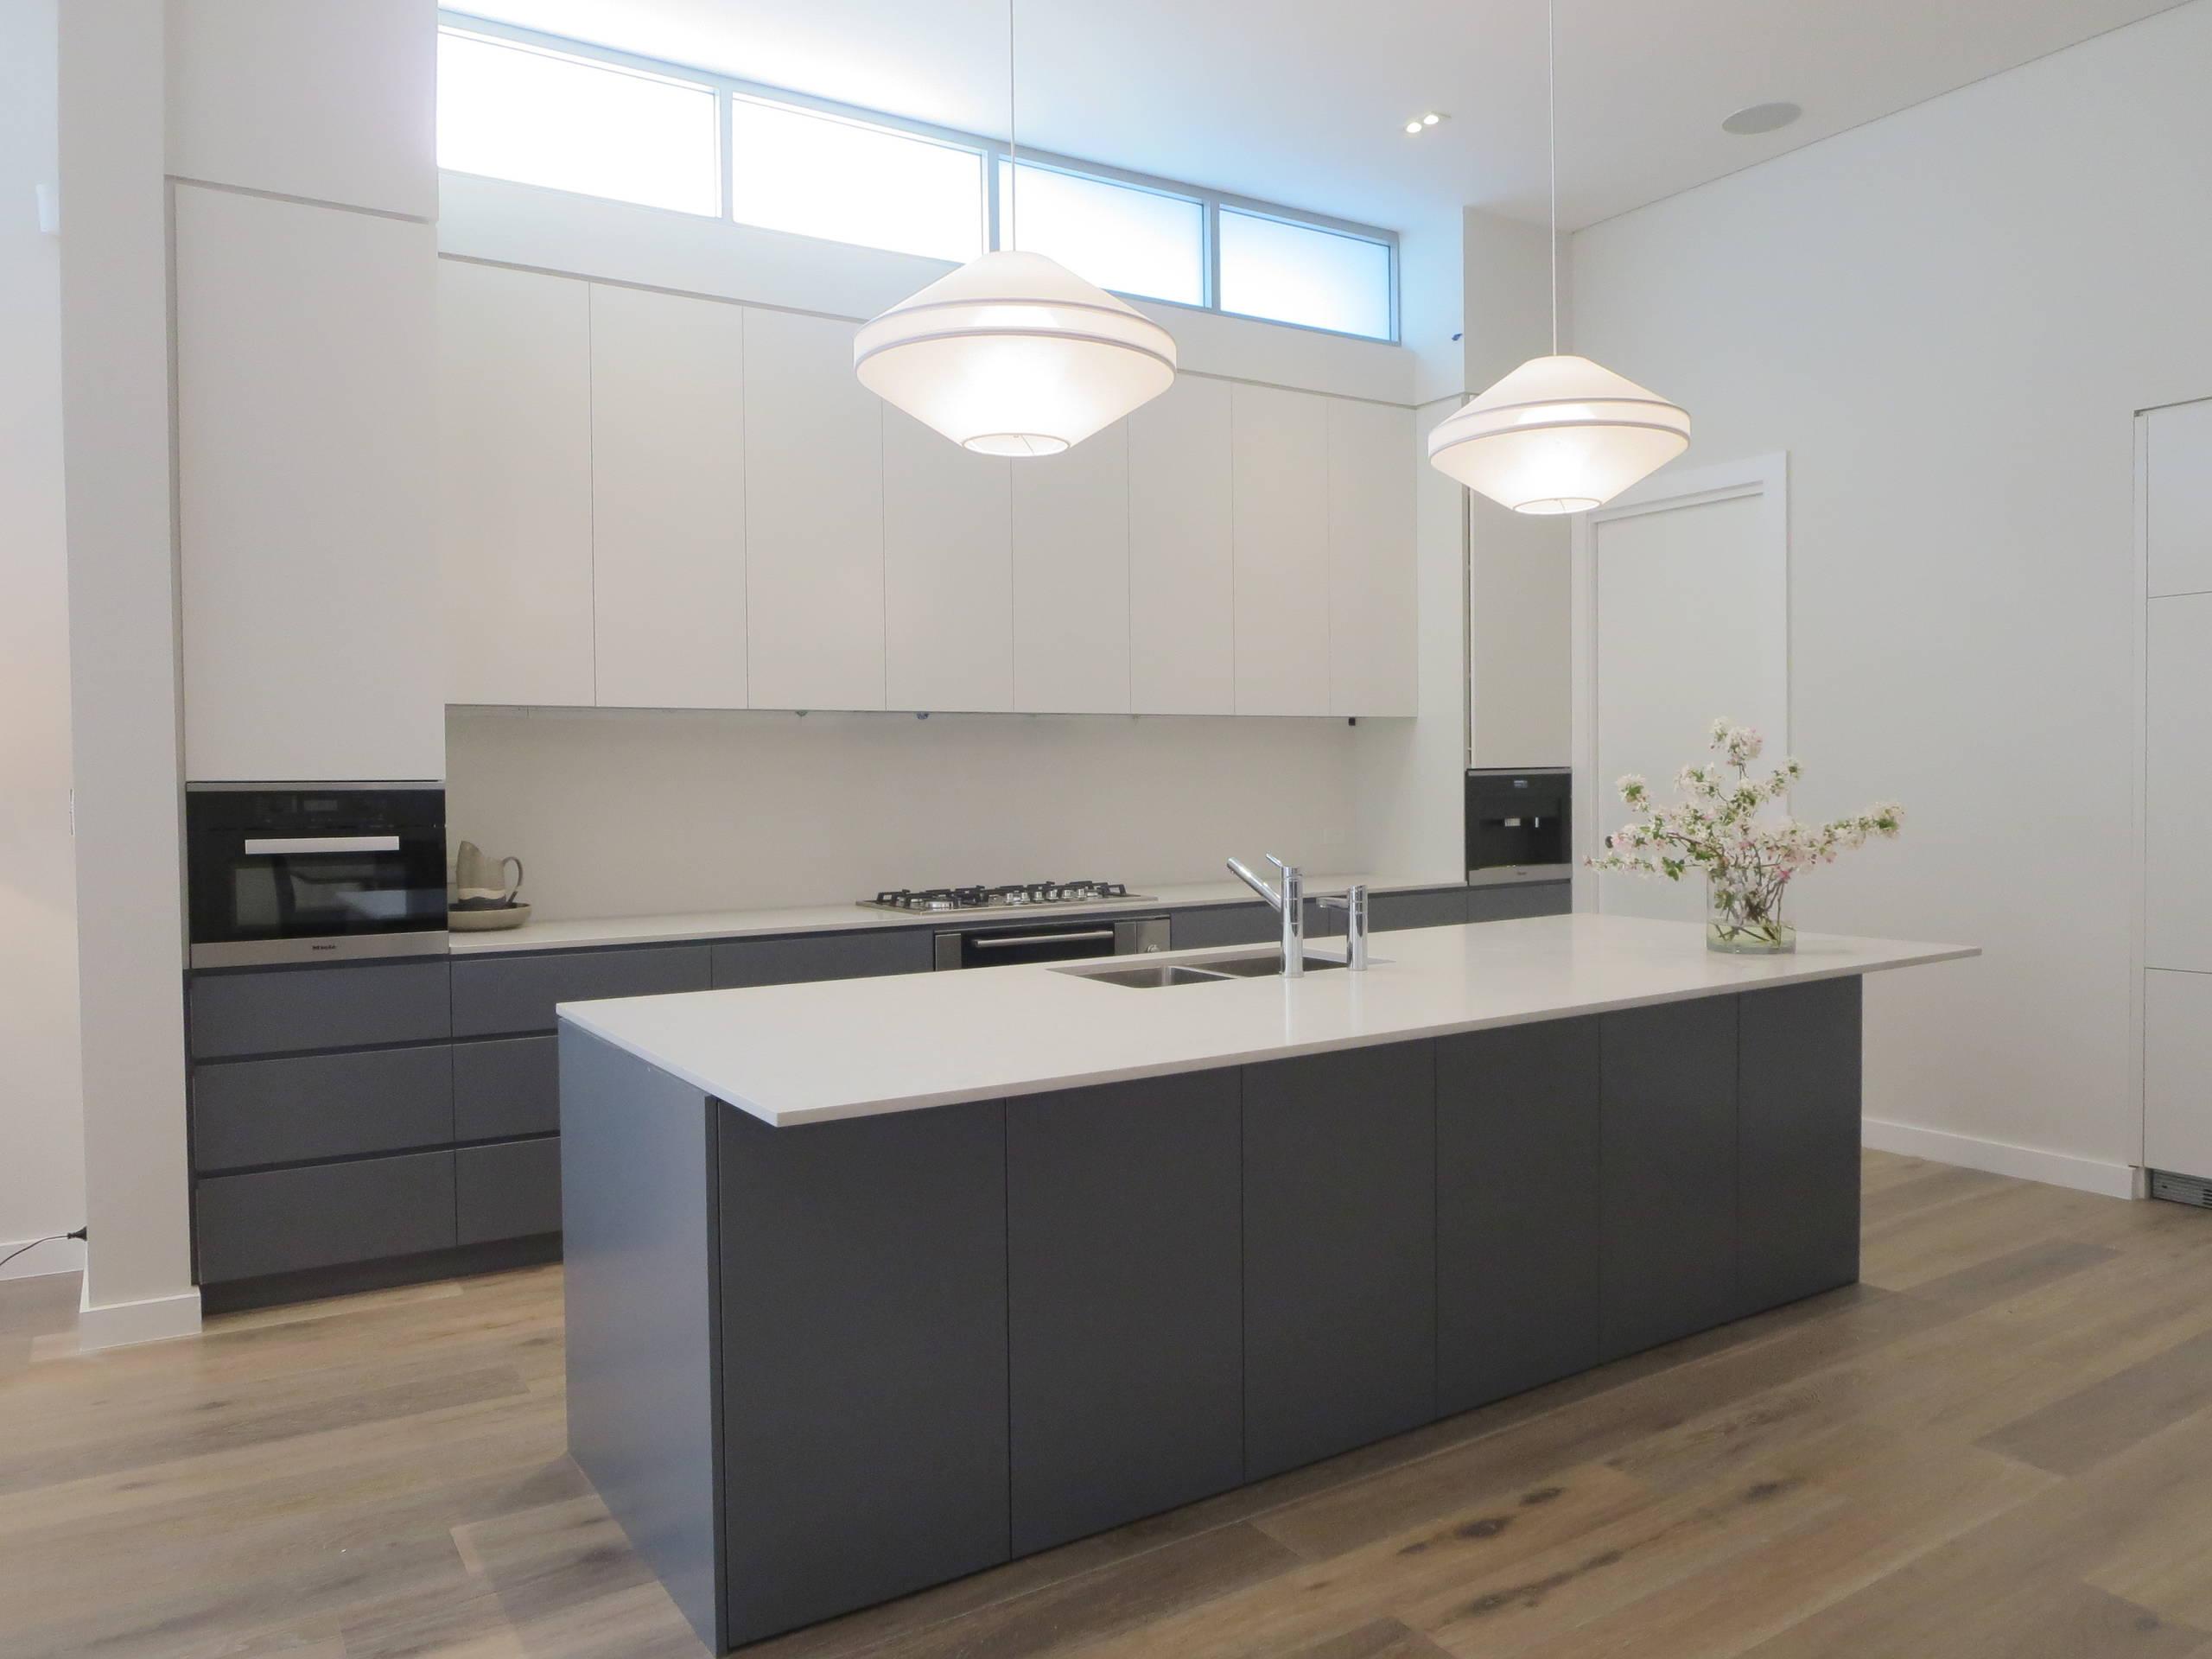 Custom Joinery & Furniture Design